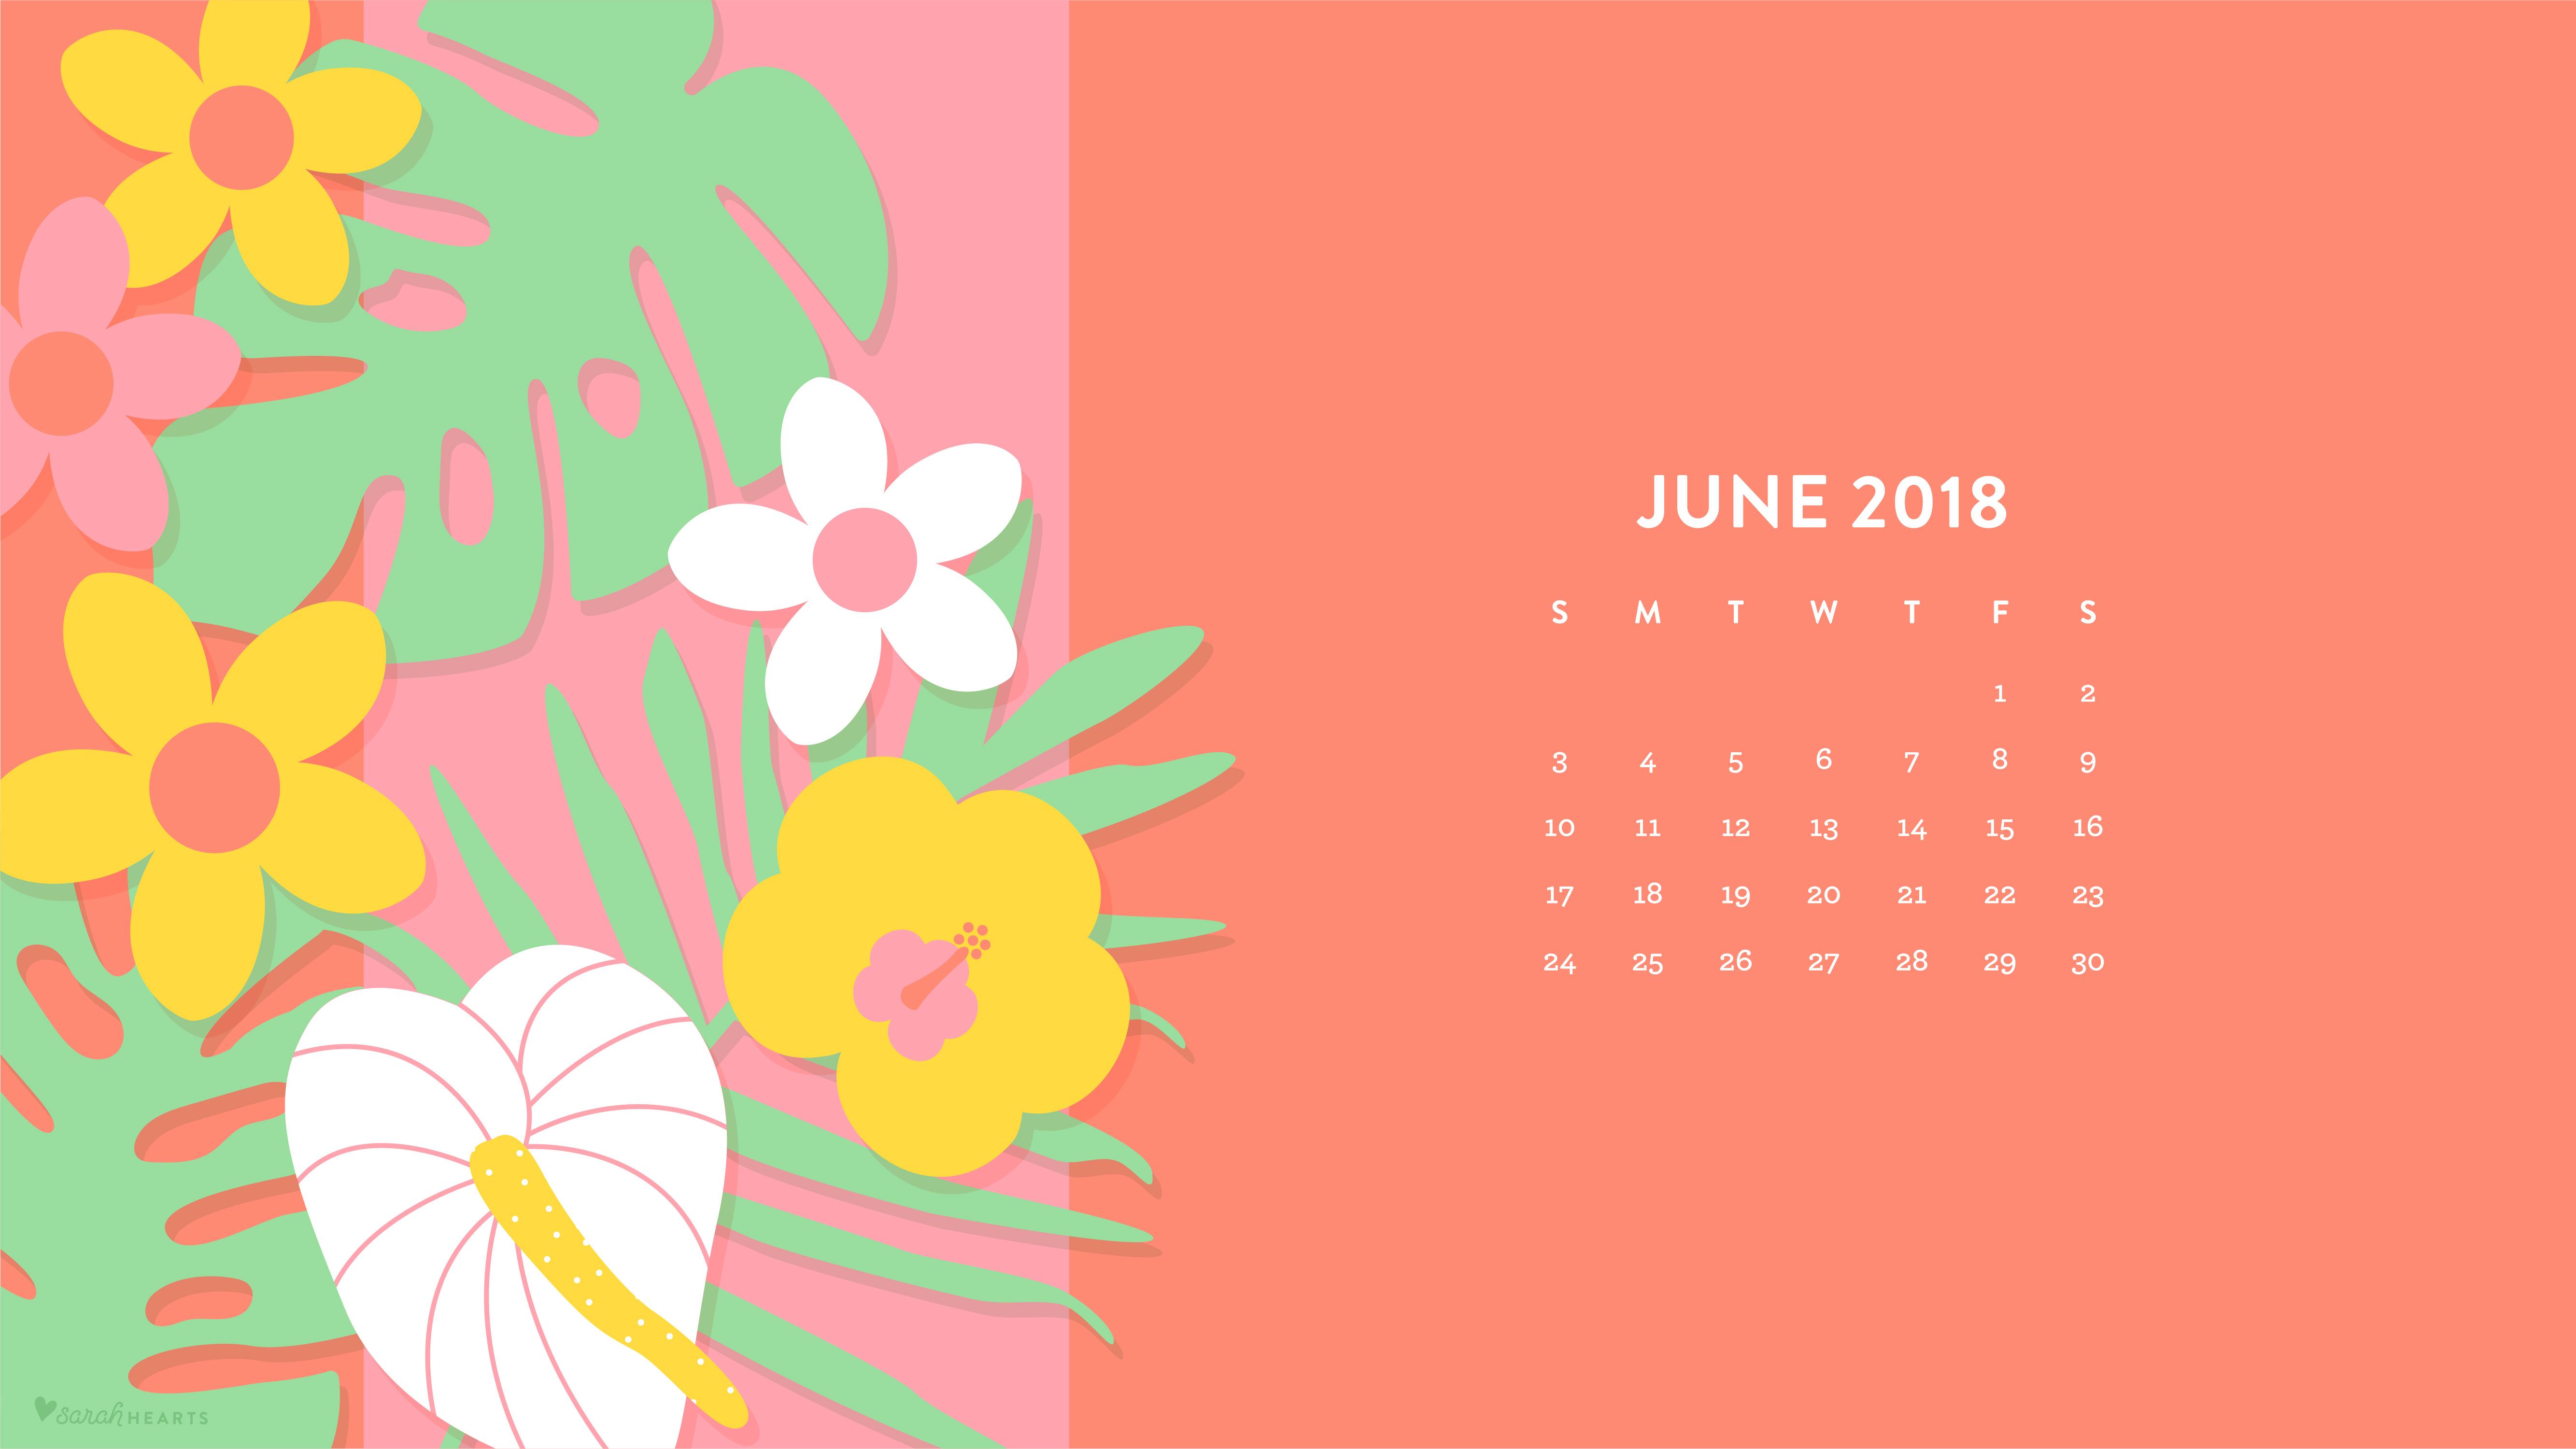 June 2018 Tropical Flowers Wallpaper   Sarah Hearts 5334x3001